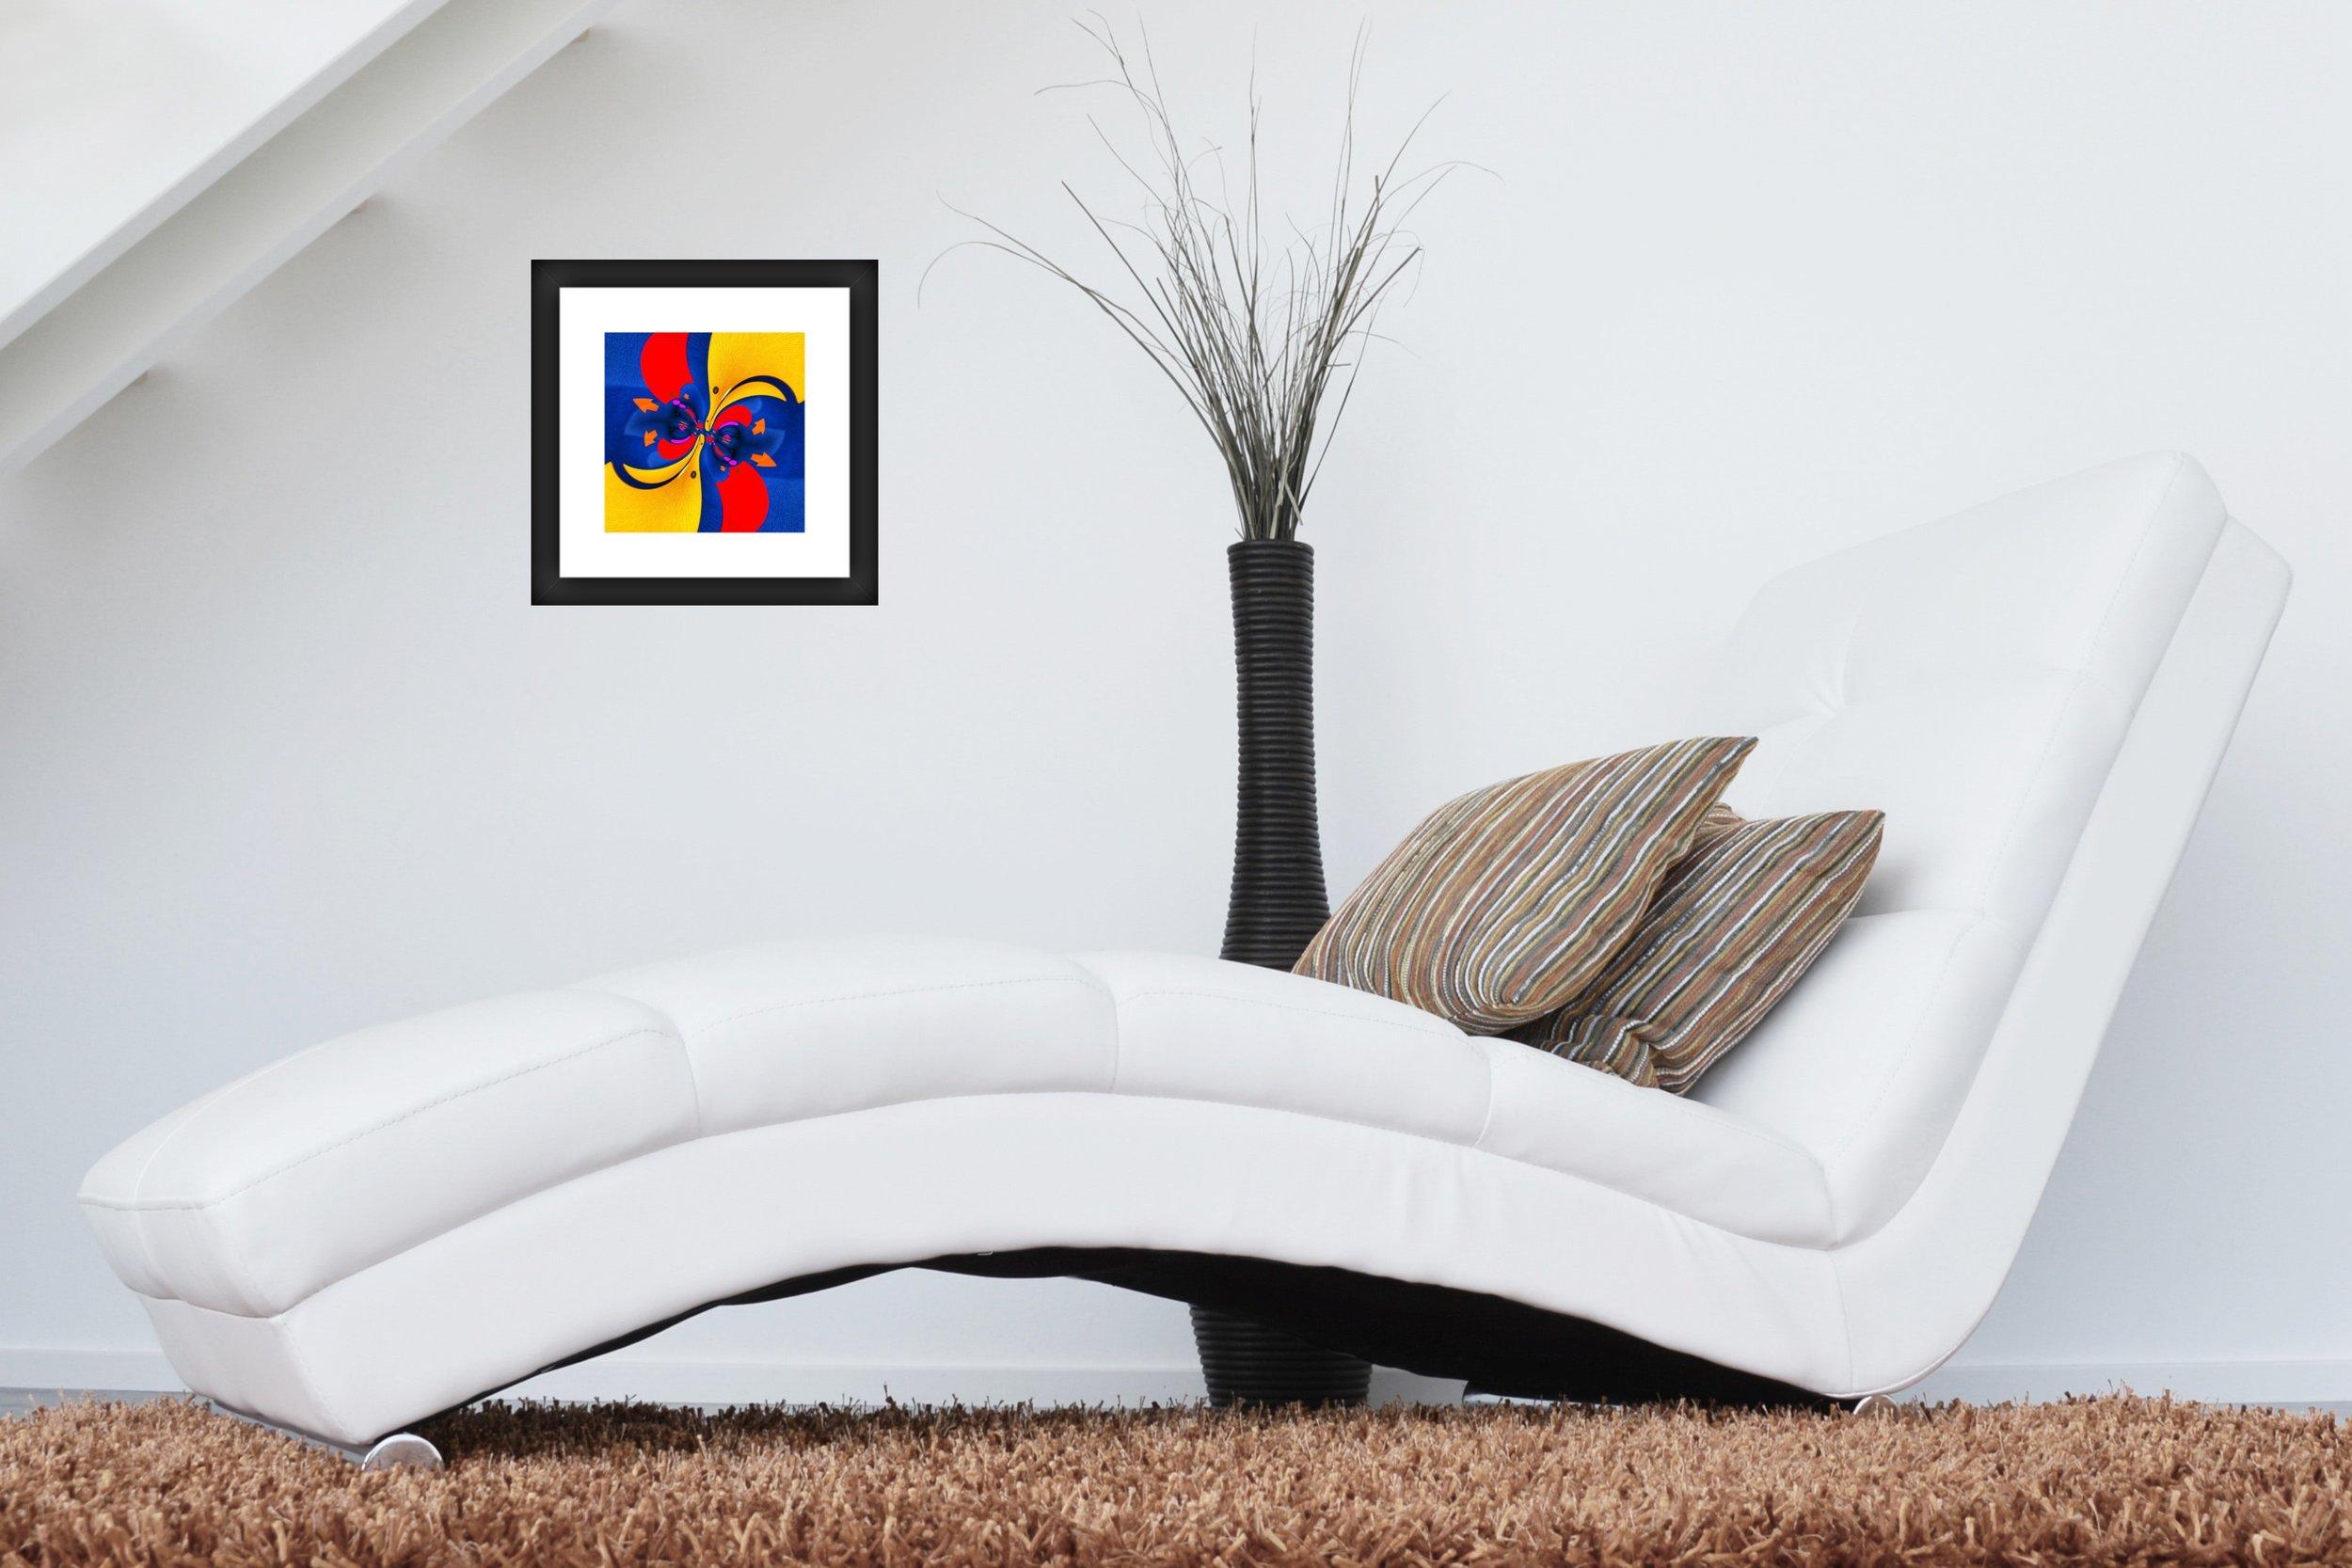 architecture-carpet-chair-276534 5.jpg